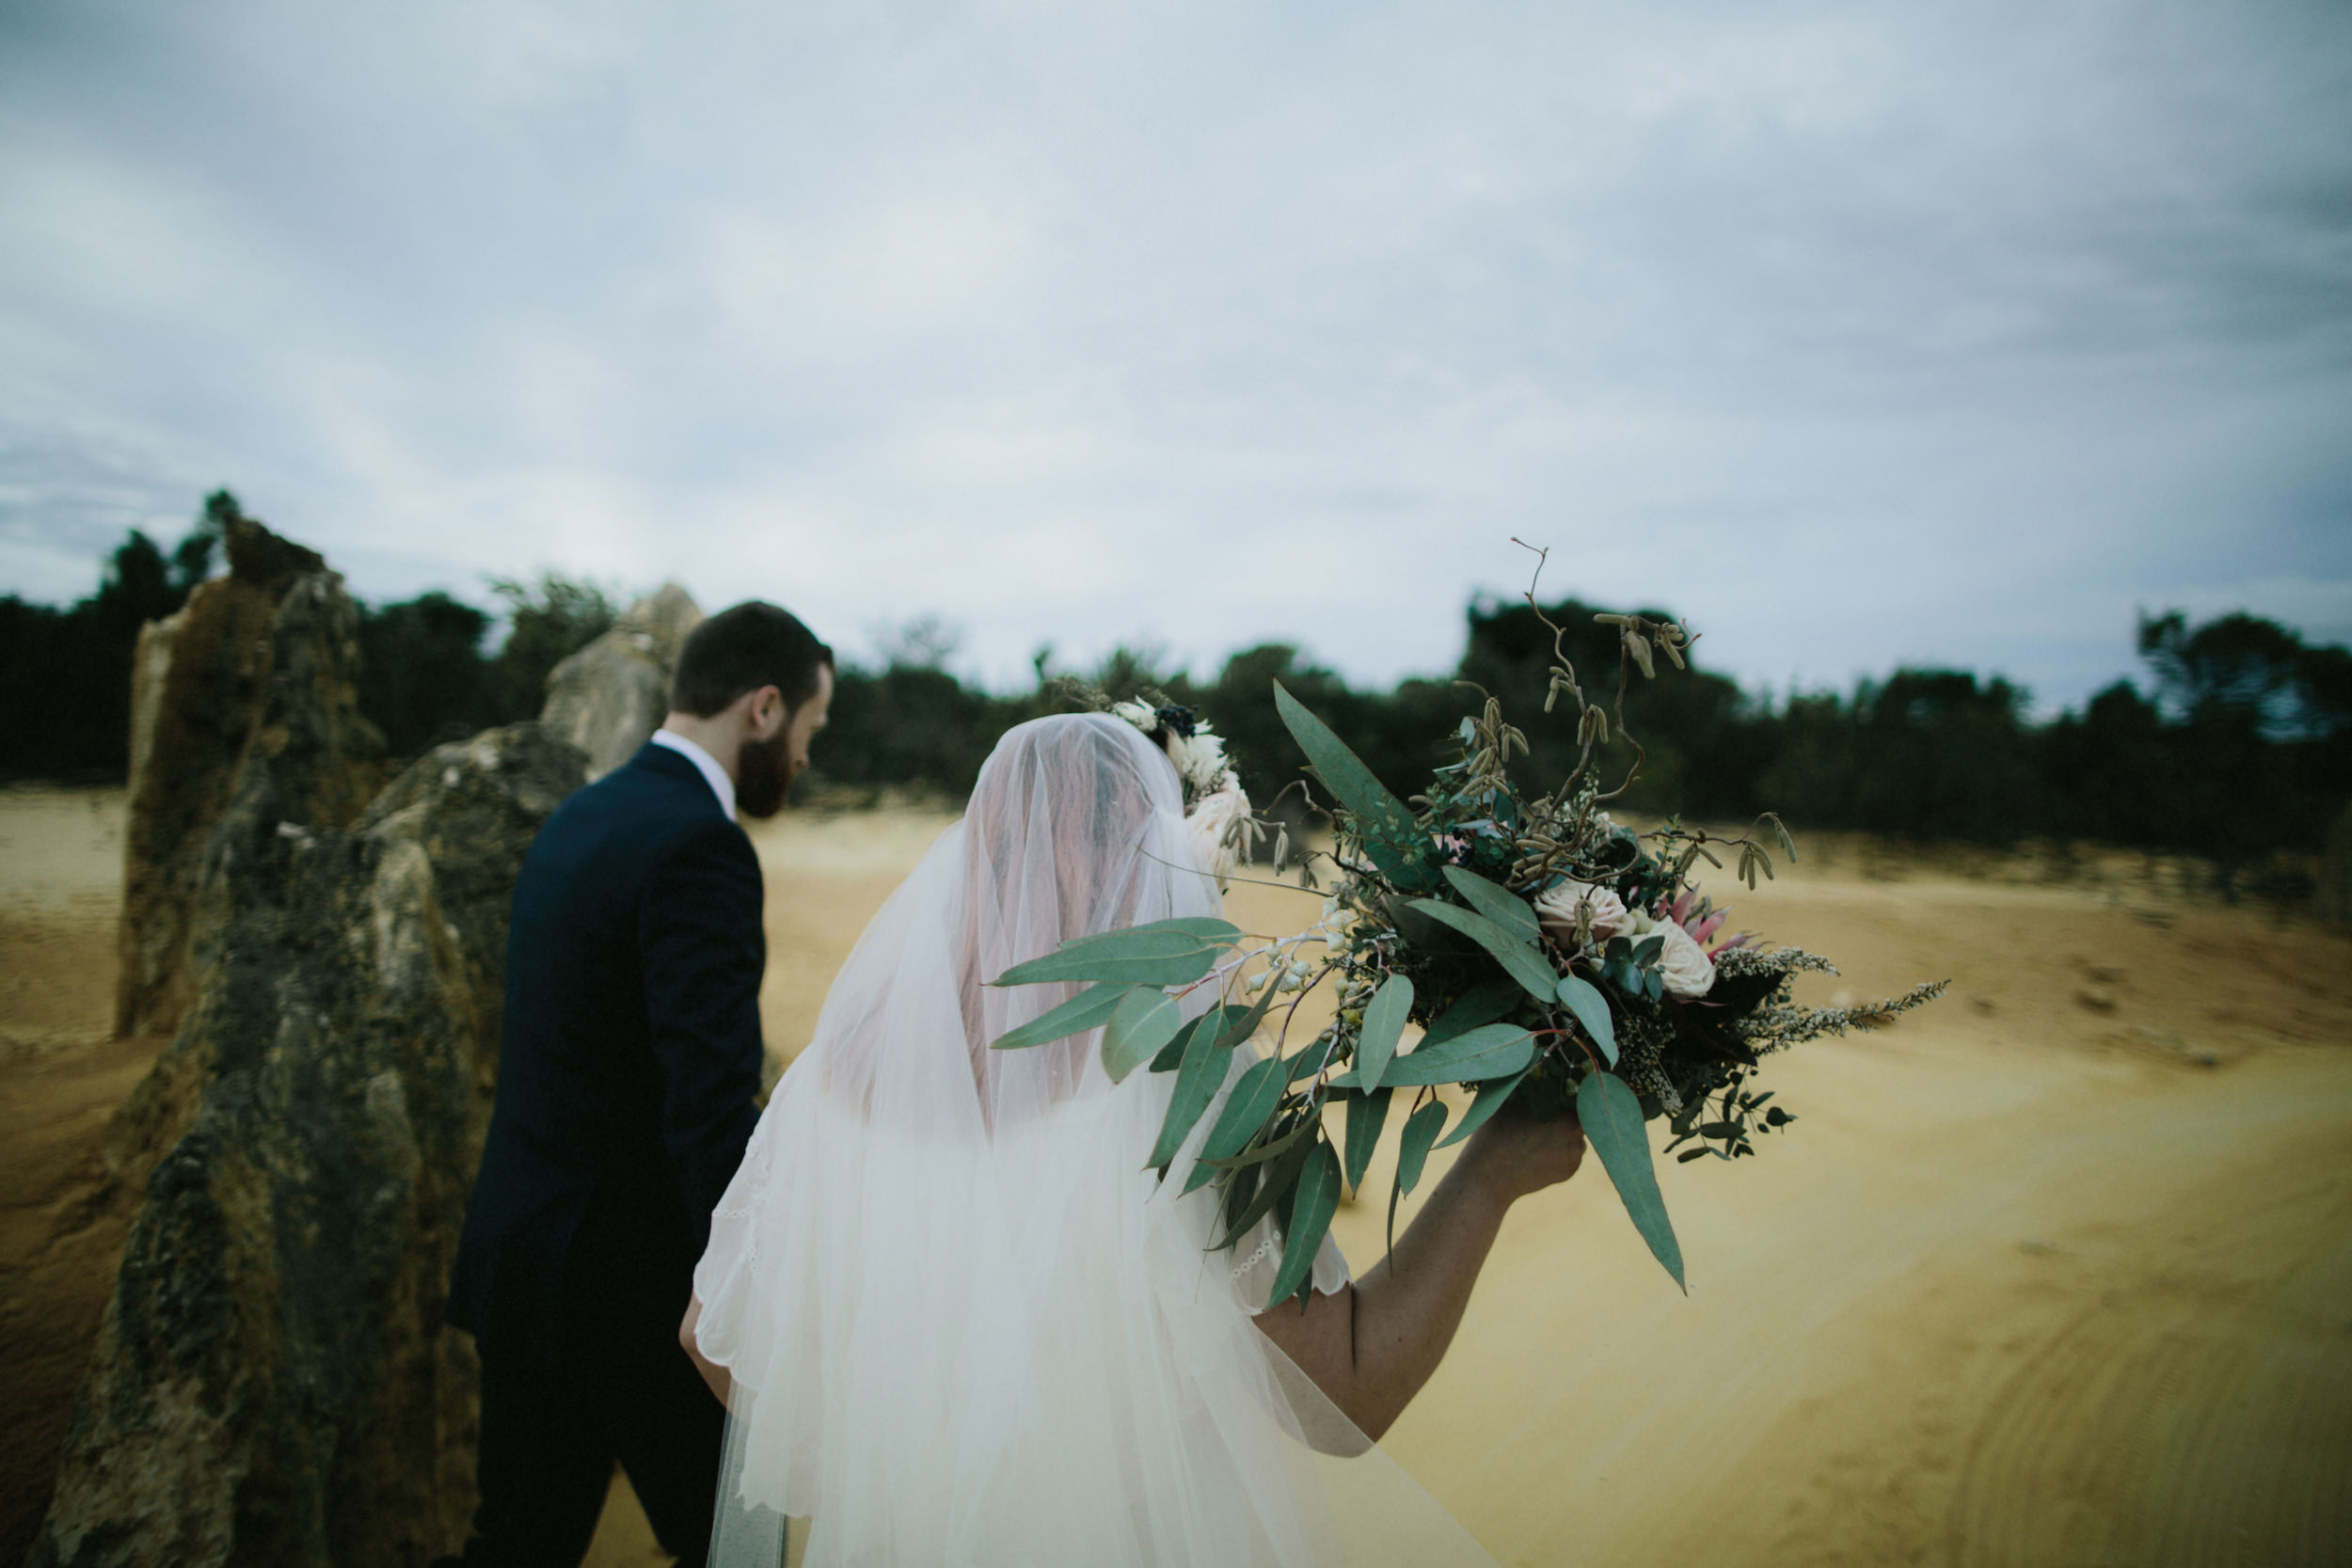 I-Got-You-Babe-Weddings-Hannah-Brent-Anniversary0030.JPG